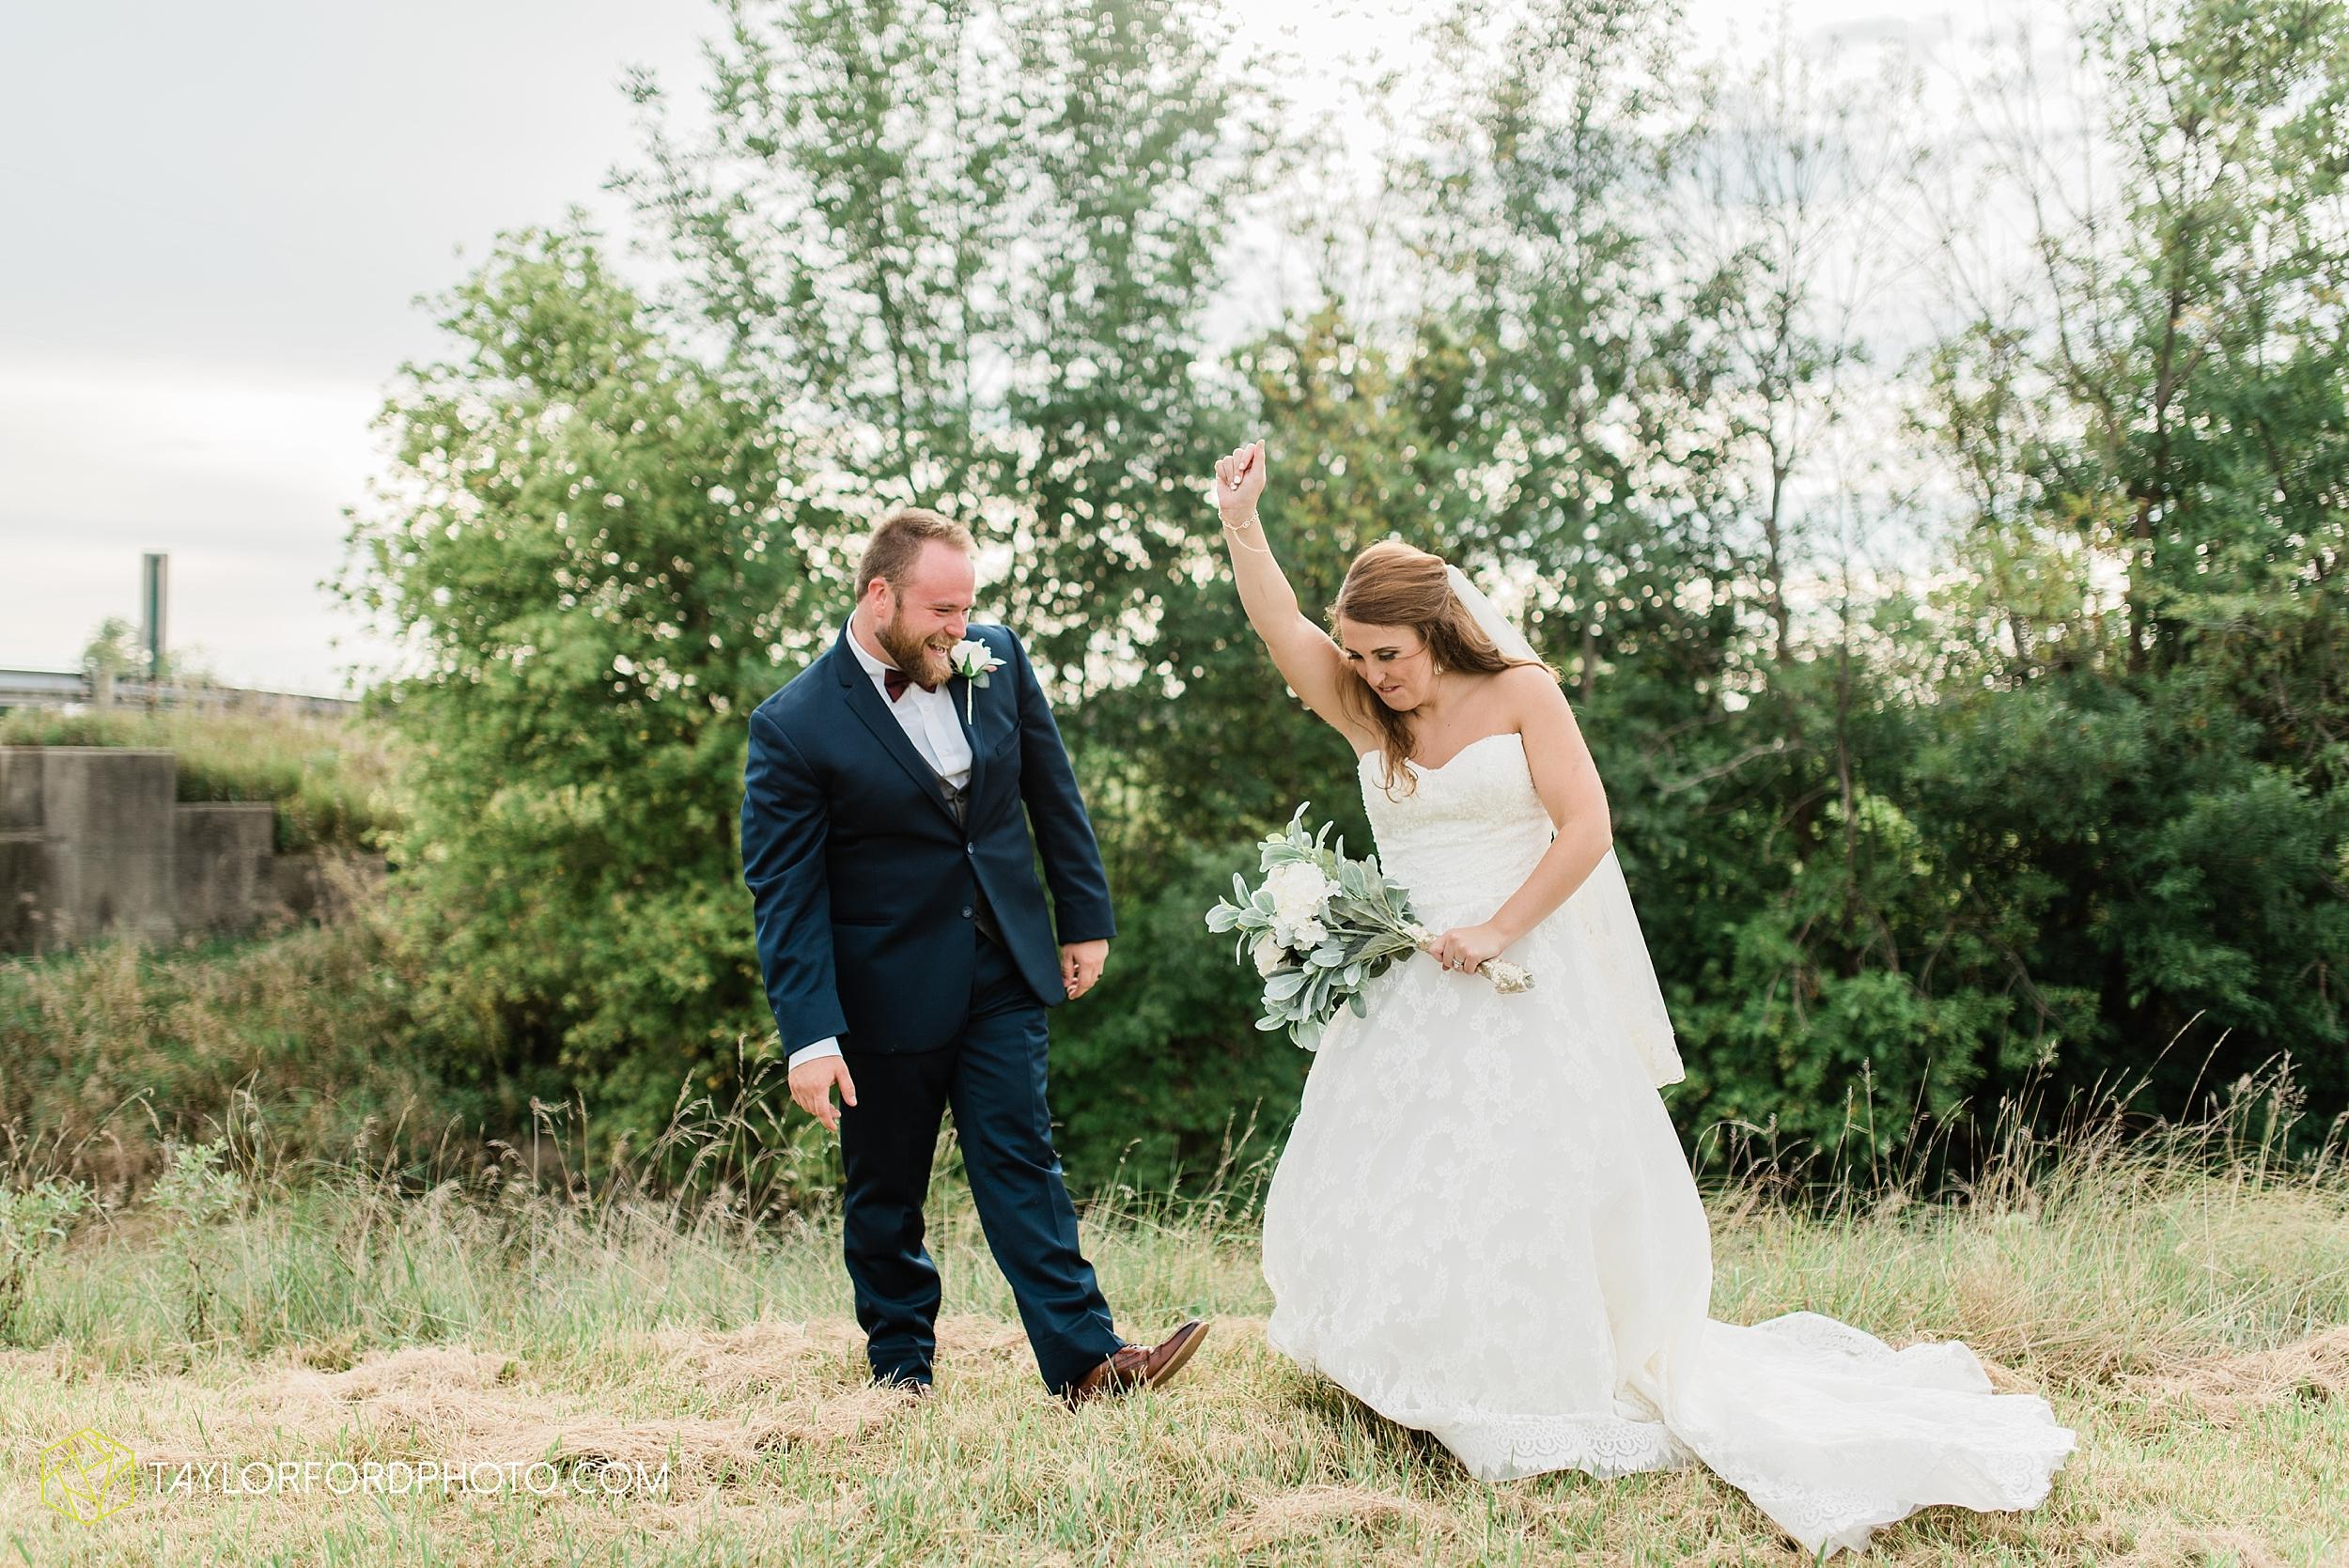 chelsey-zosh-jackson-young-first-united-methodist-church-senior-center-van-wert-ohio-wedding-photographer-taylor-ford-photography_0091.jpg